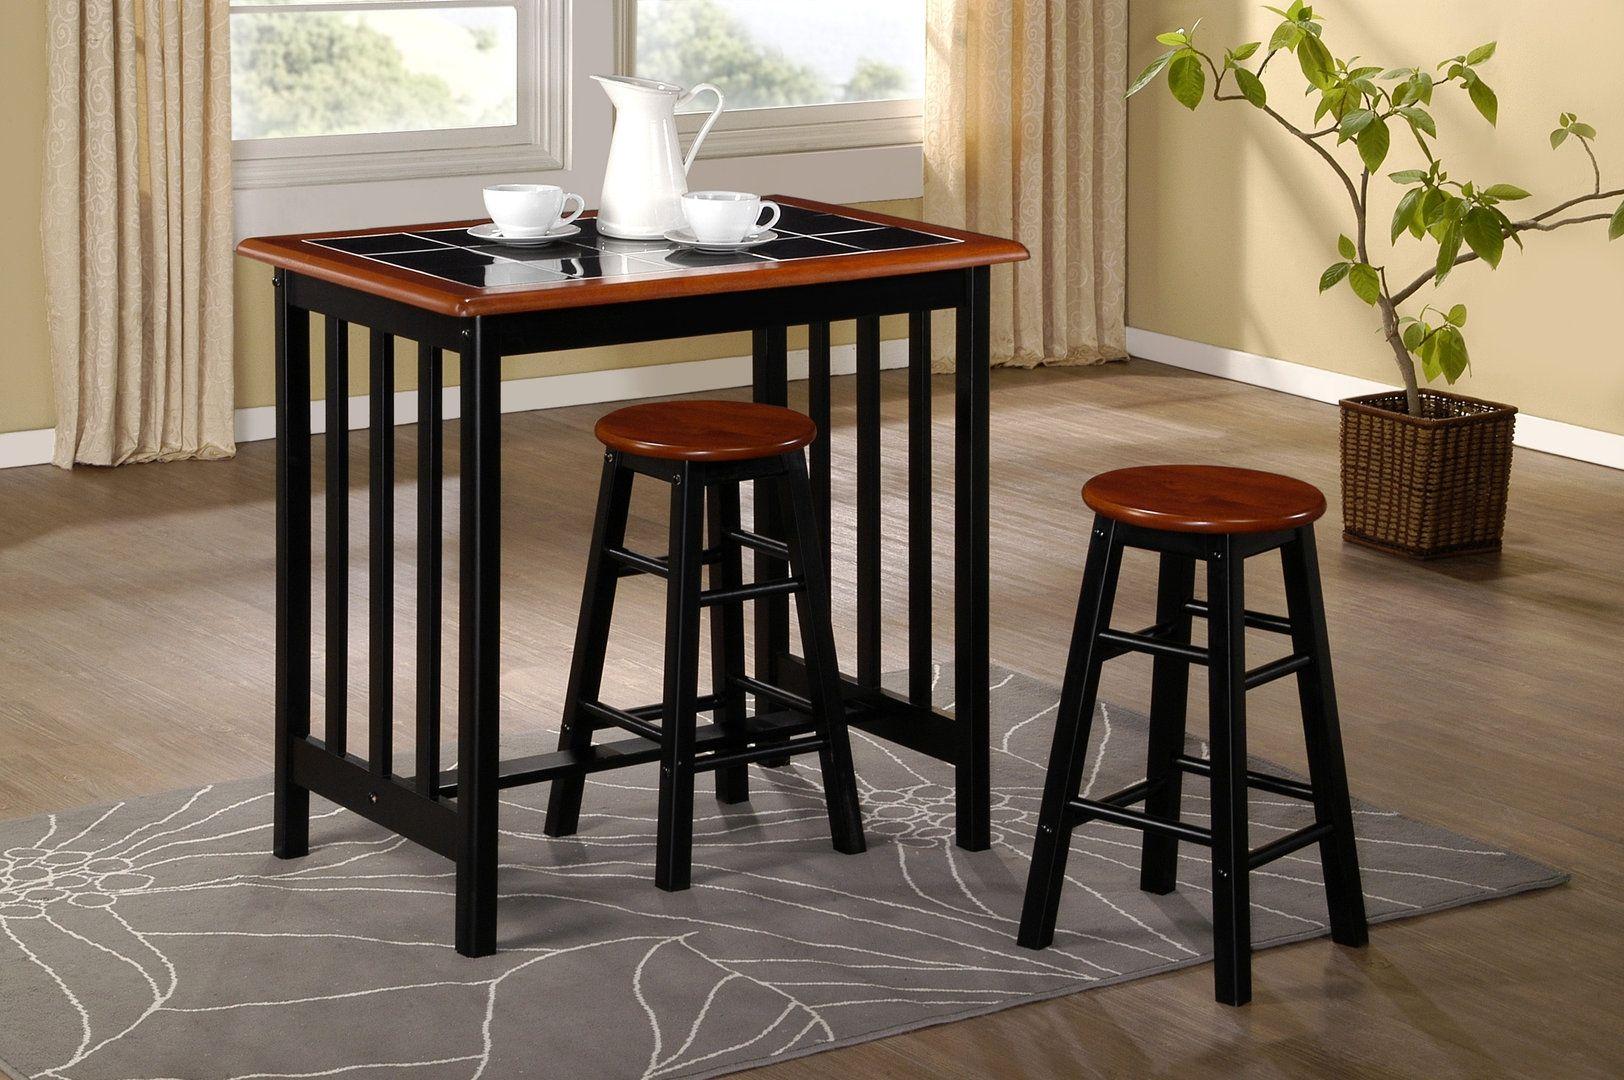 breakfast bars furniture. High Breakfast Bar Table And Chairs Bars Furniture